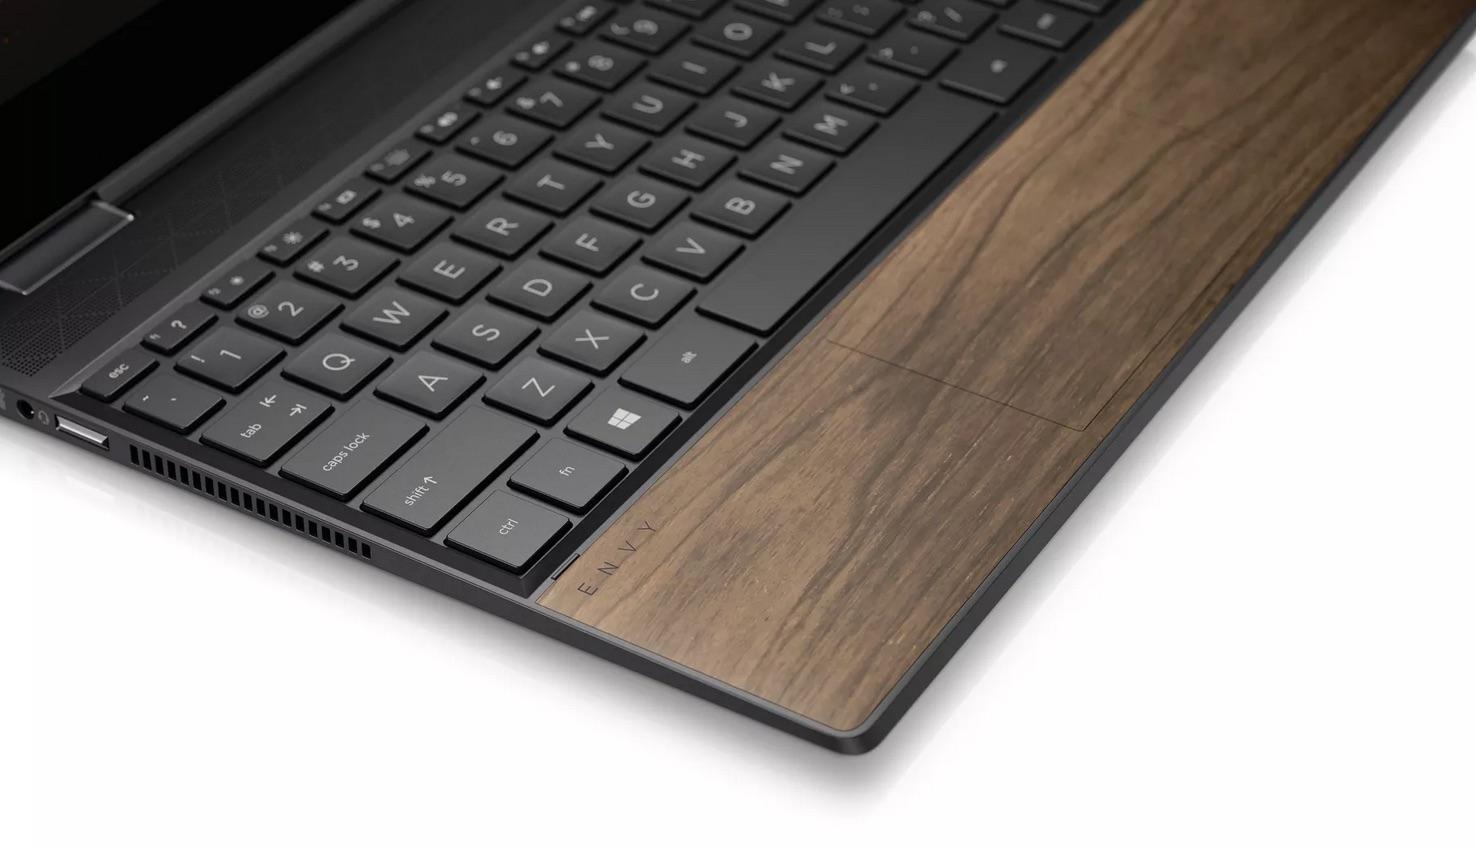 da167a57d94d7 Ahşap kaplamalı HP notebook'lar yolda - MediaTrend